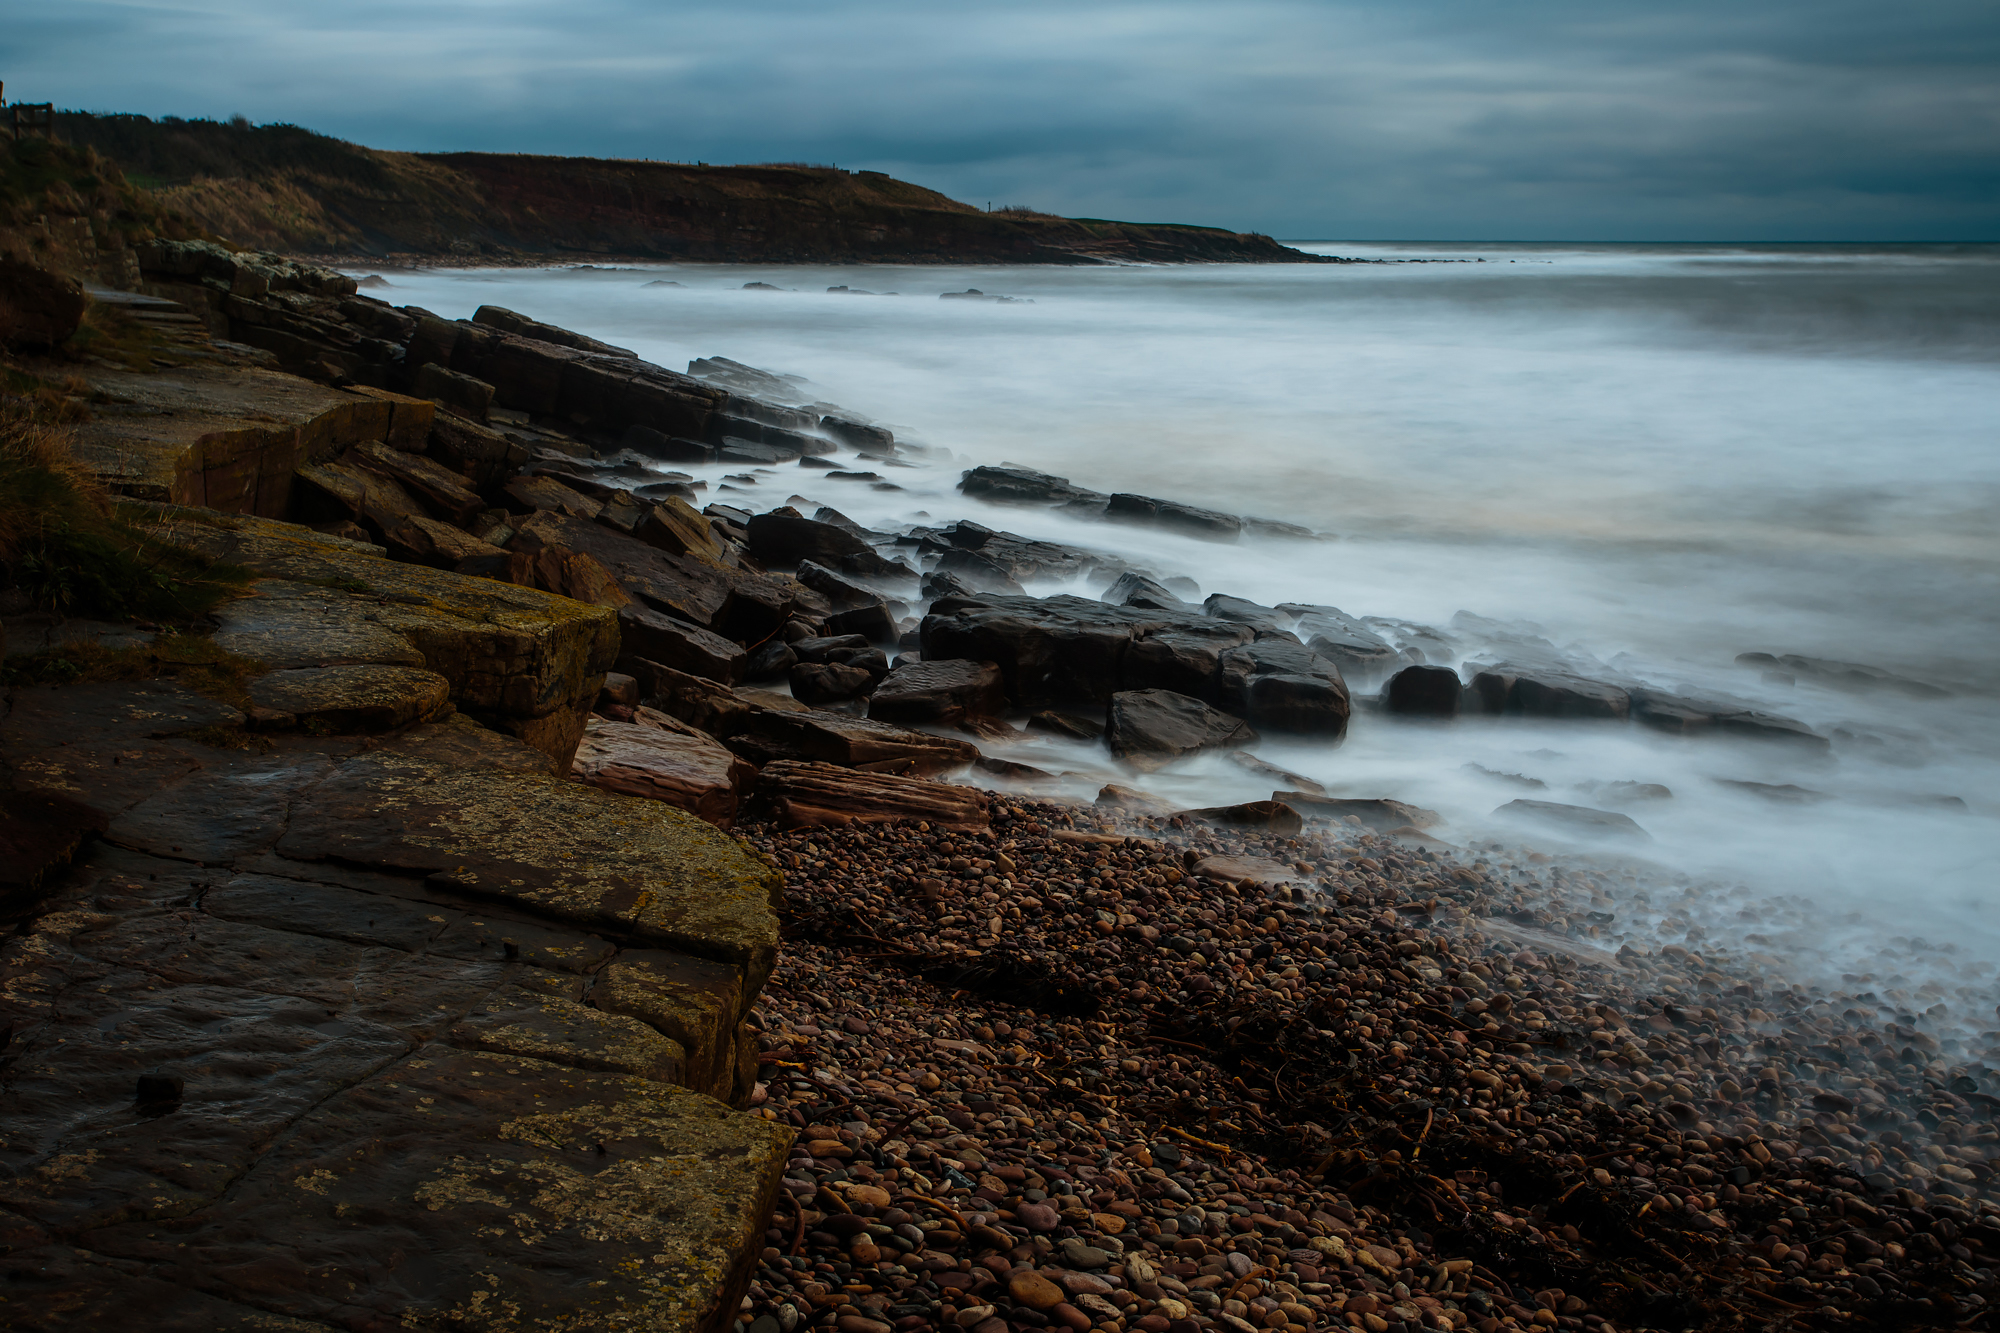 Fife Coastline